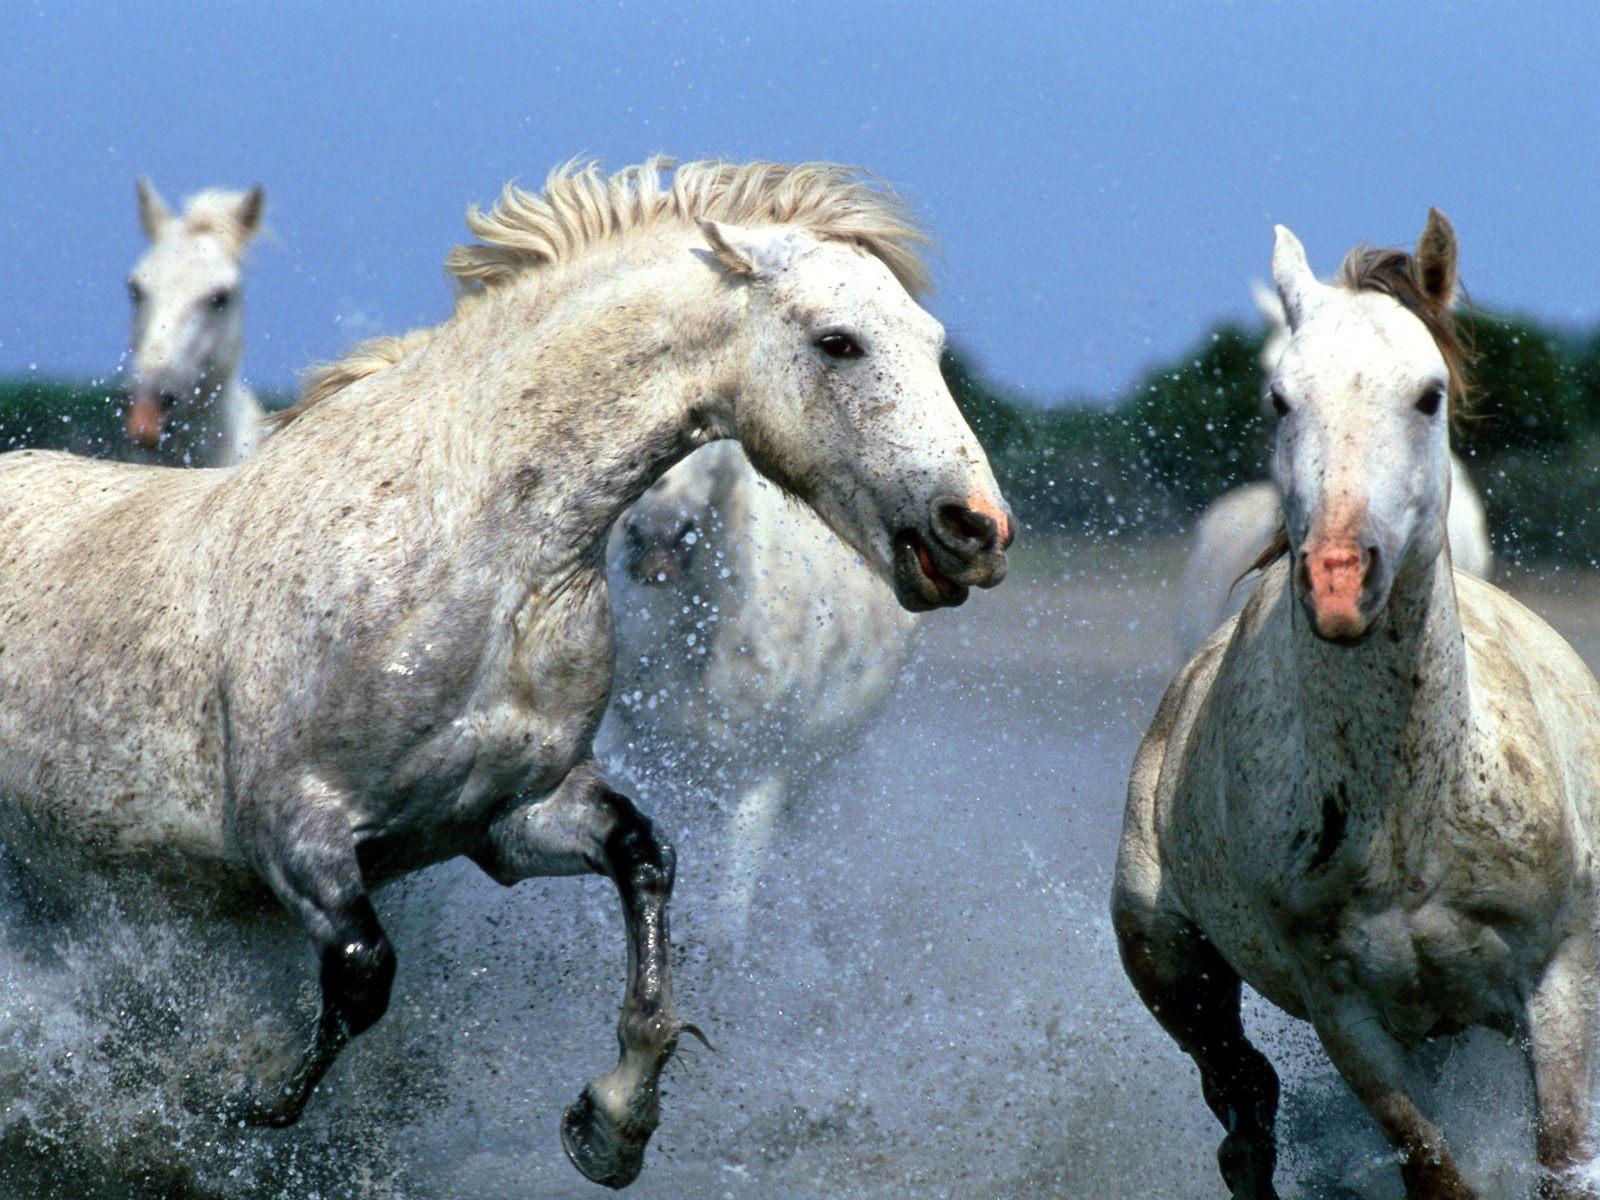 Animals Zoo Park Horses Wallpapers for Desktop 1600x1200